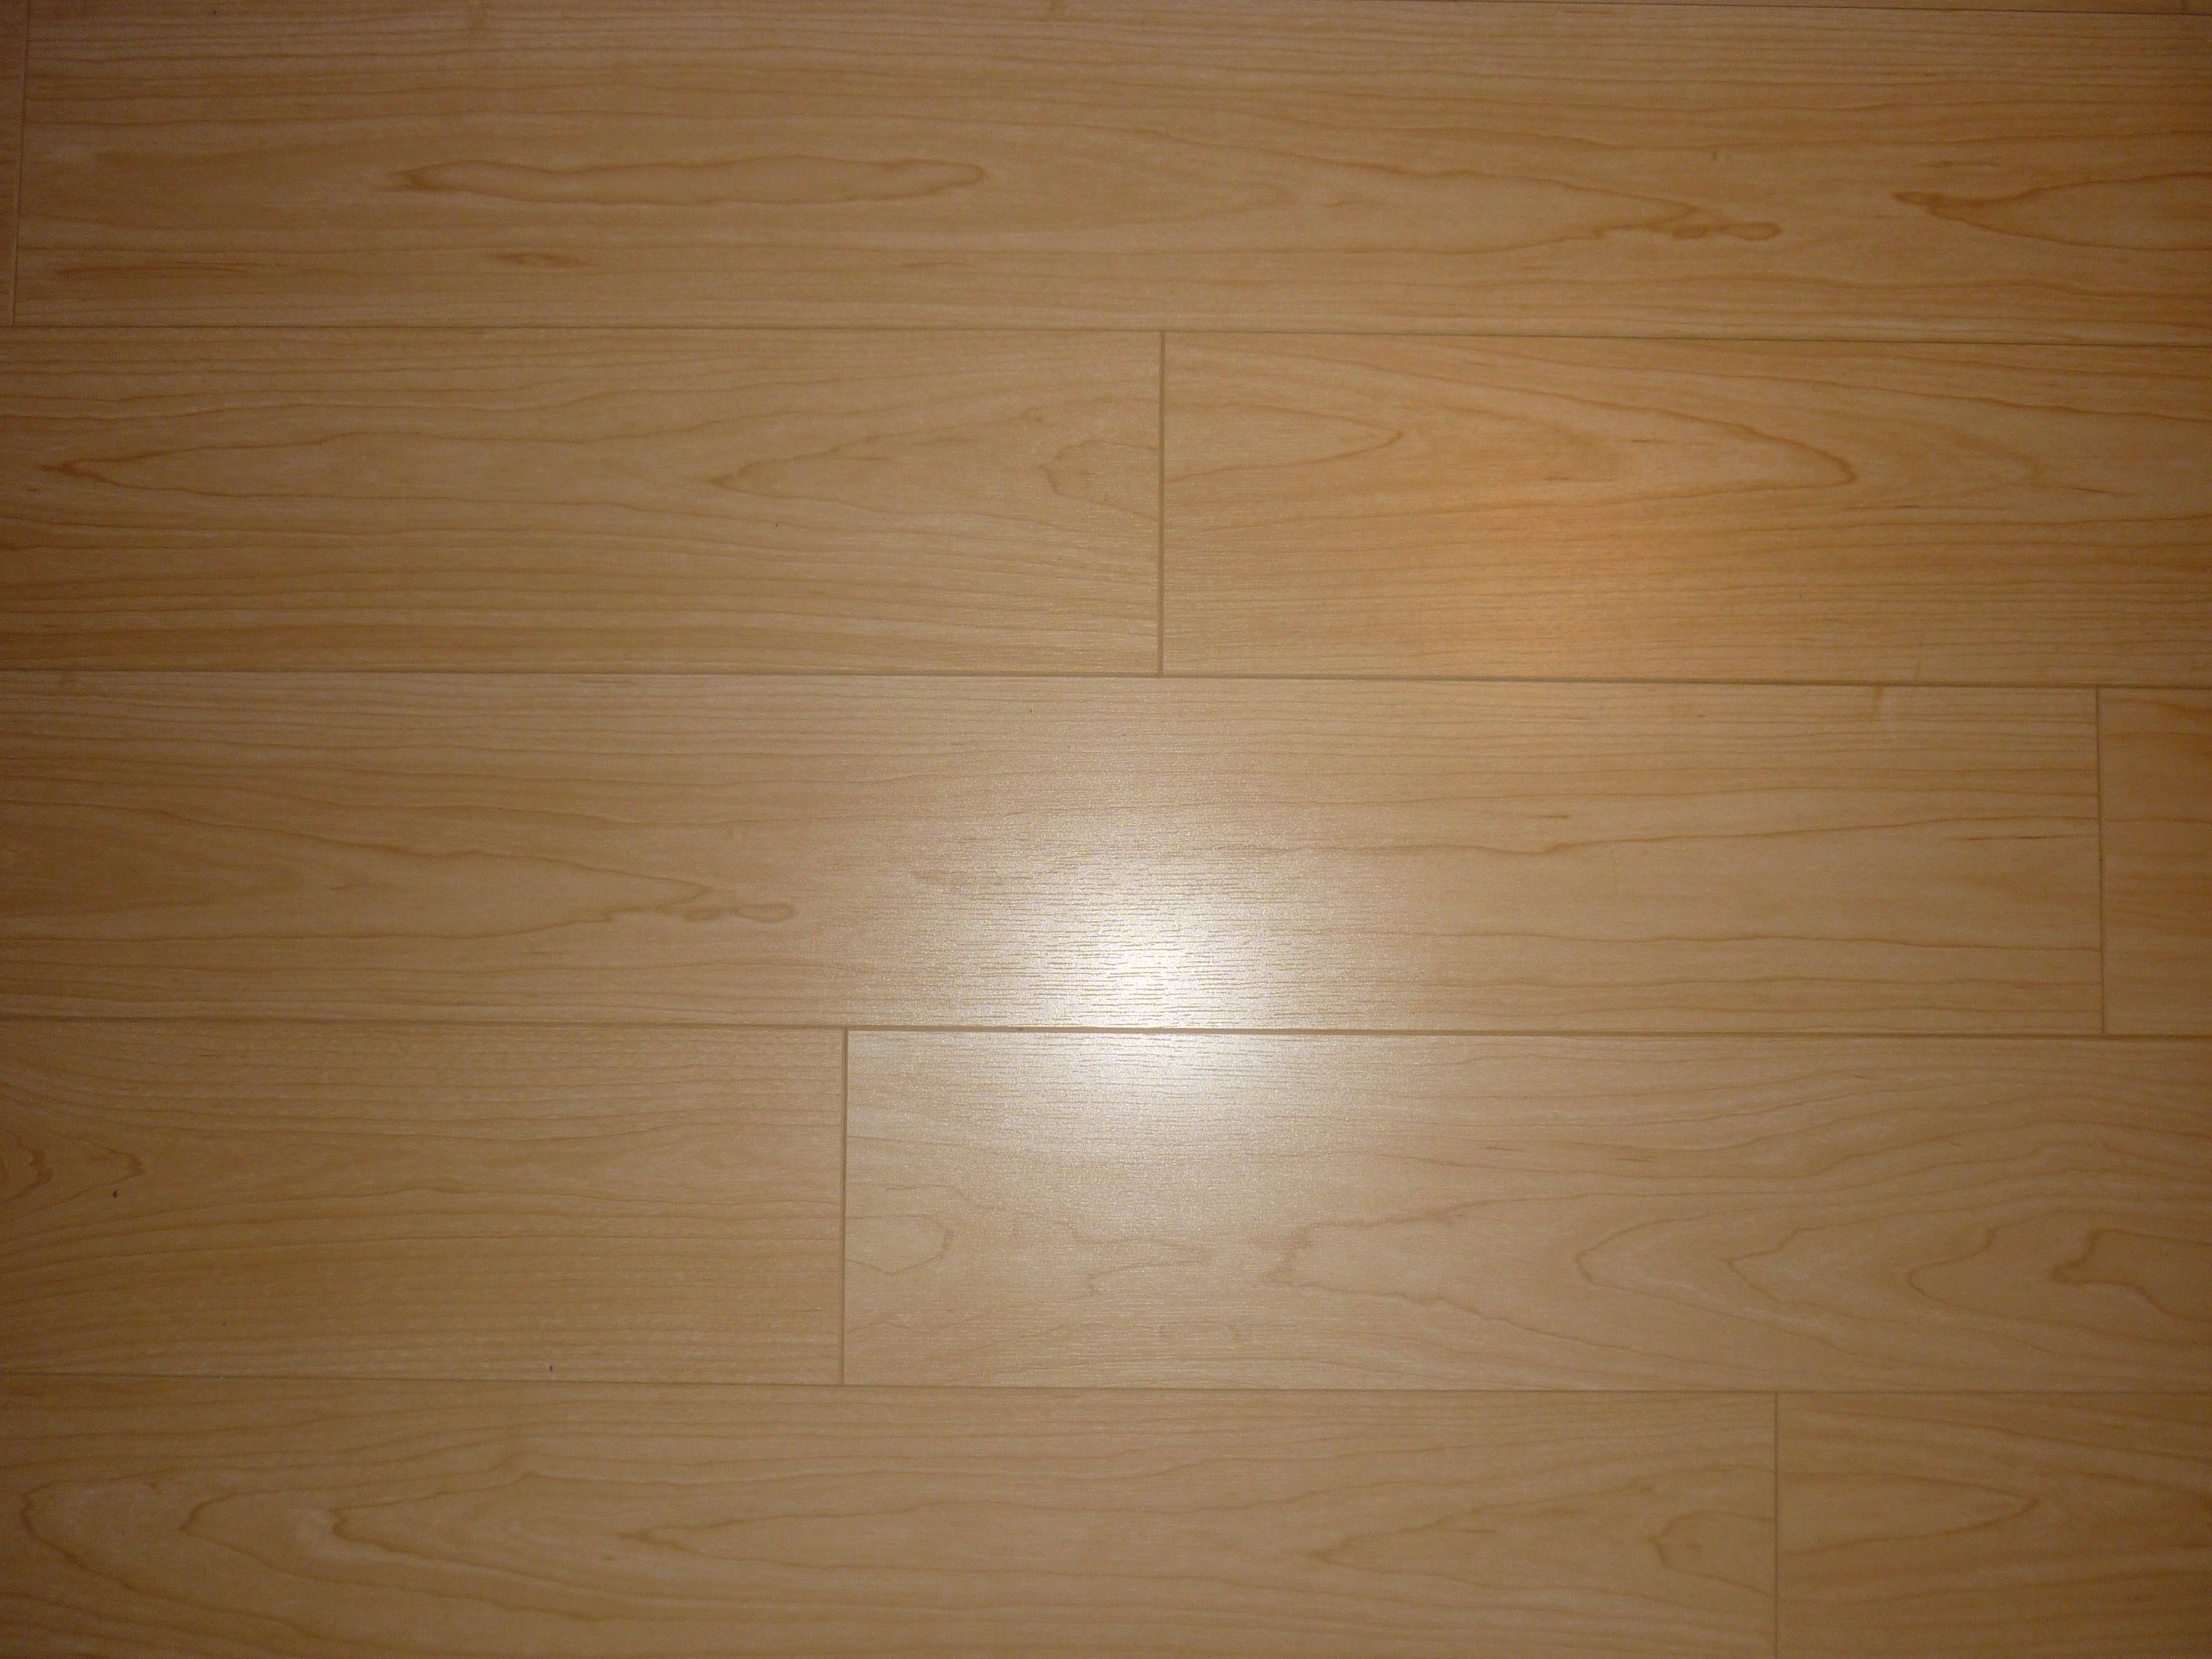 laminate wood flooring dogs photo - 2